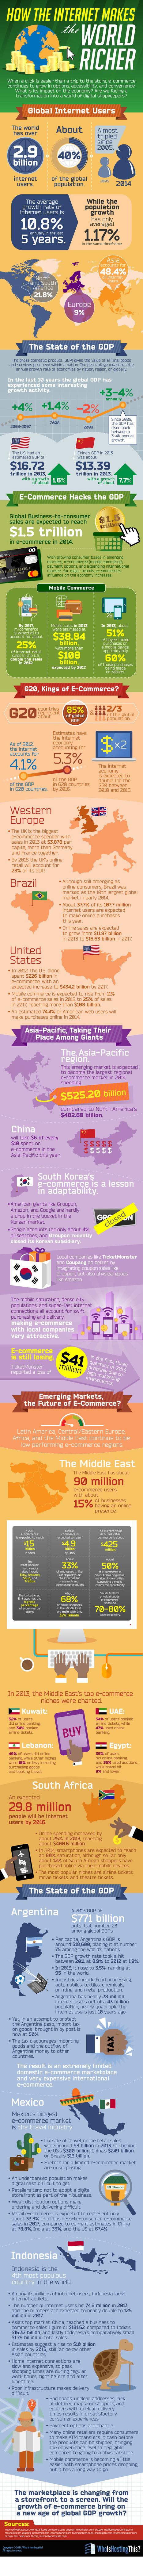 Internet hace la Mundo más rico #infografia #infographic   Seo, Social Media Marketing   Scoop.it